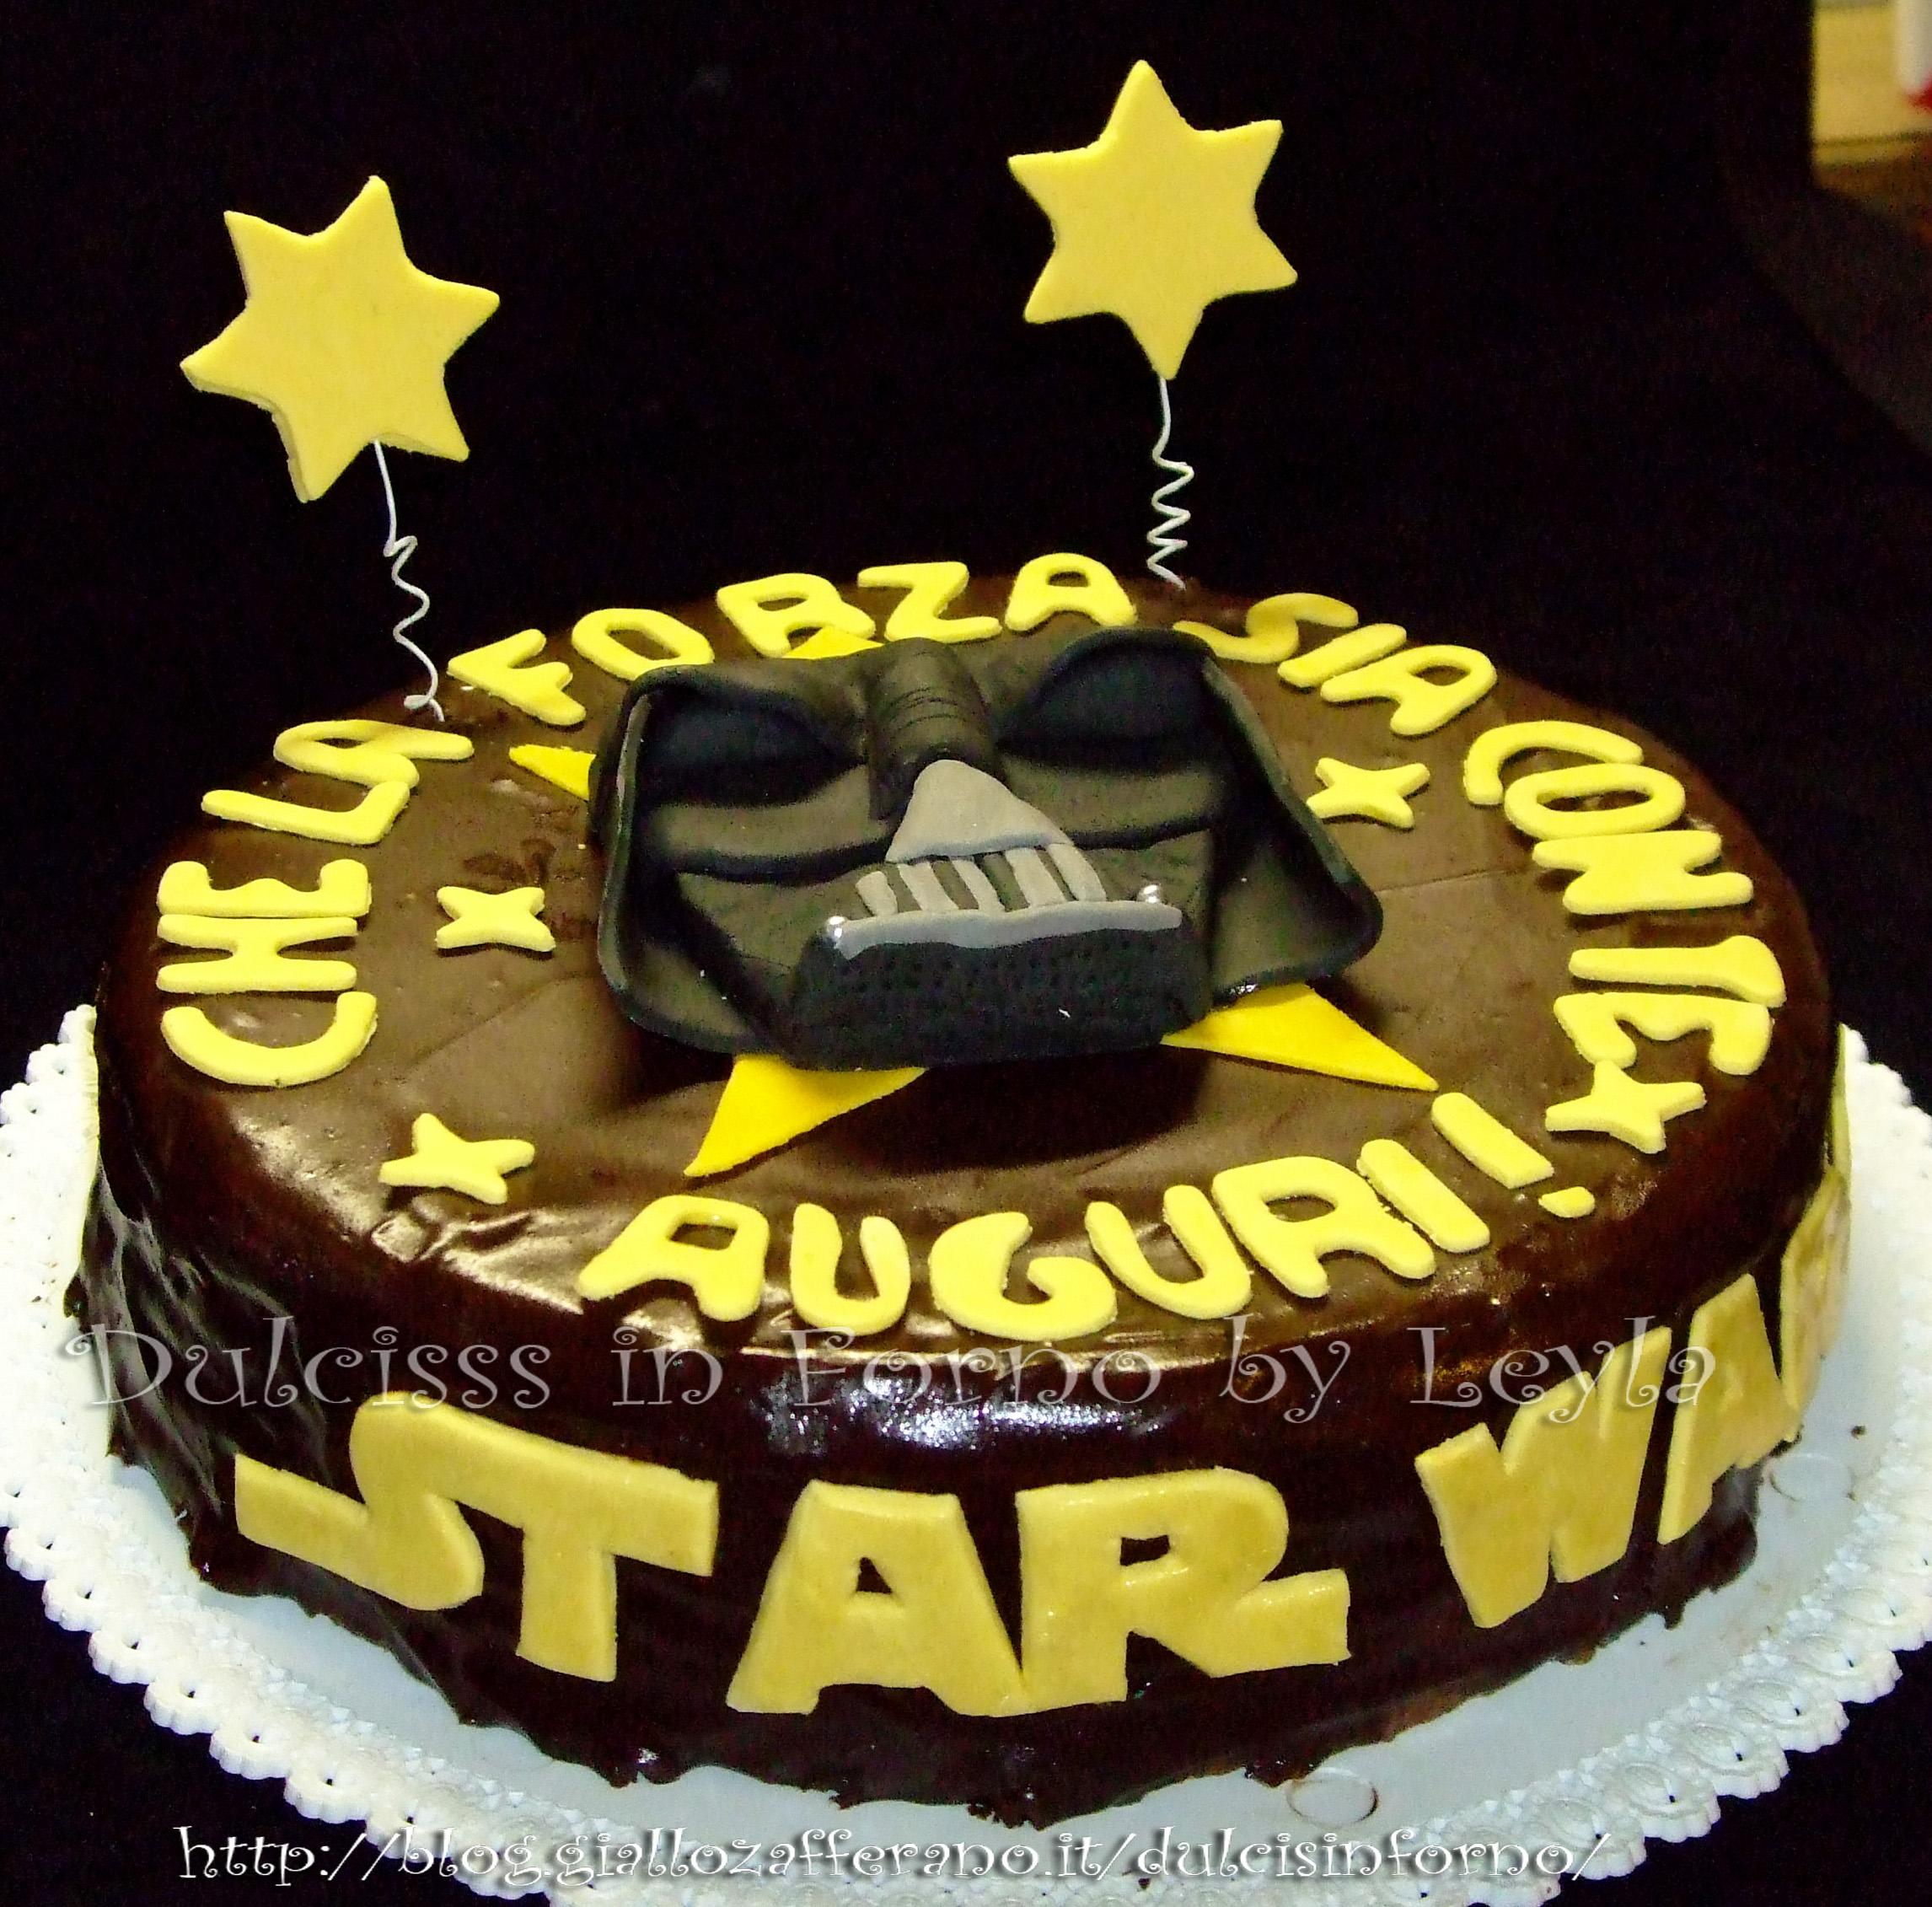 Favoloso Star Wars Cake - torta Guerre Stellari, decorata in pasta di zucchero YX86